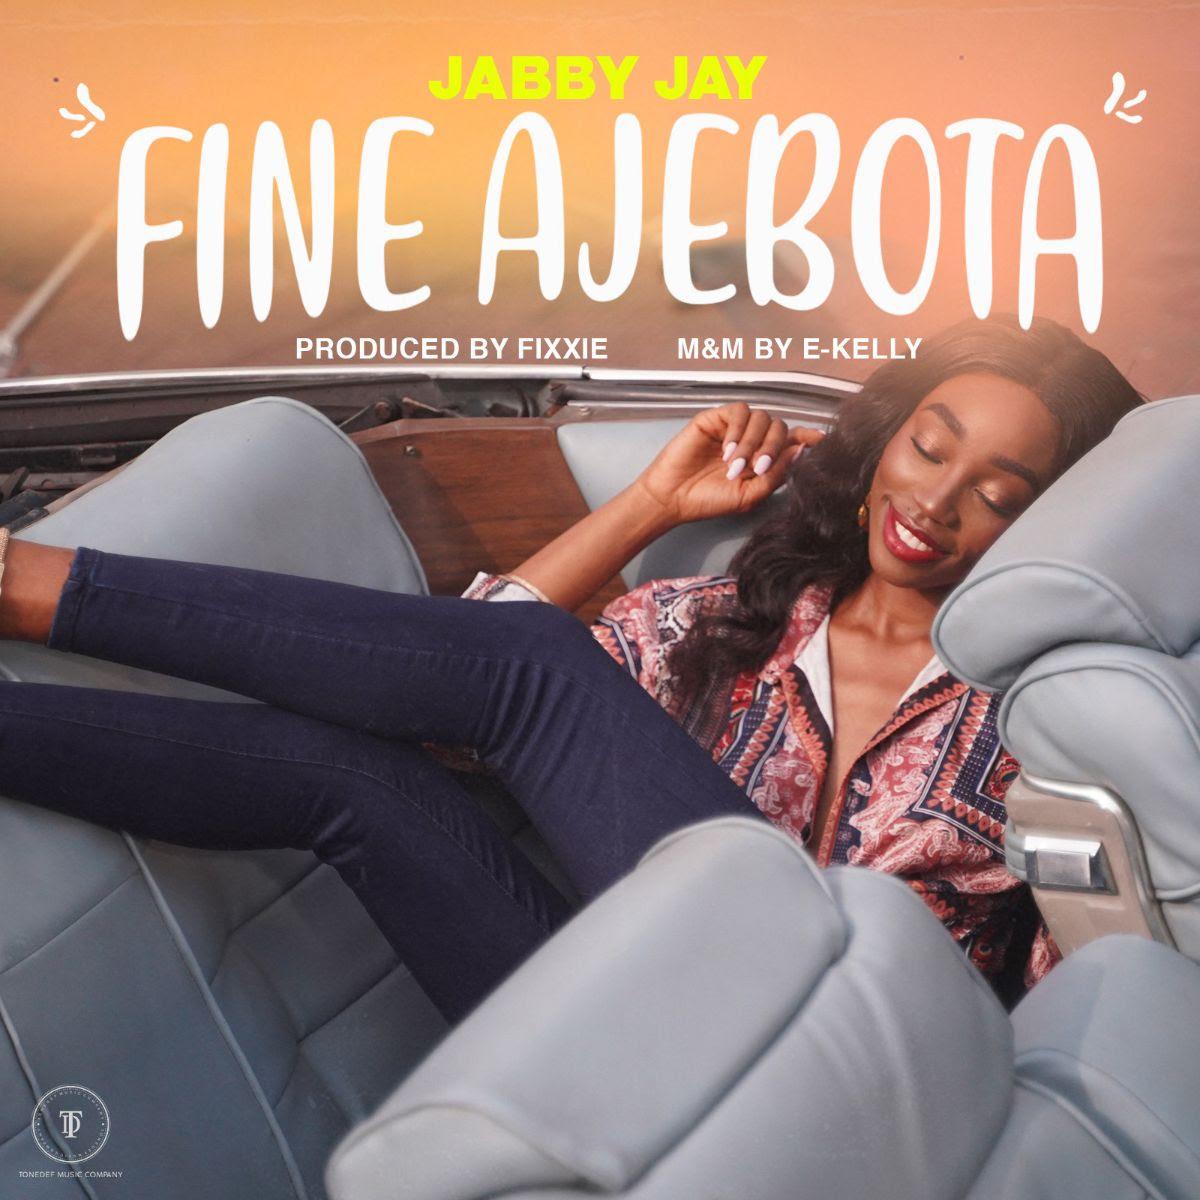 Jabby Jay Releases New Single ''Fine Ajebota'